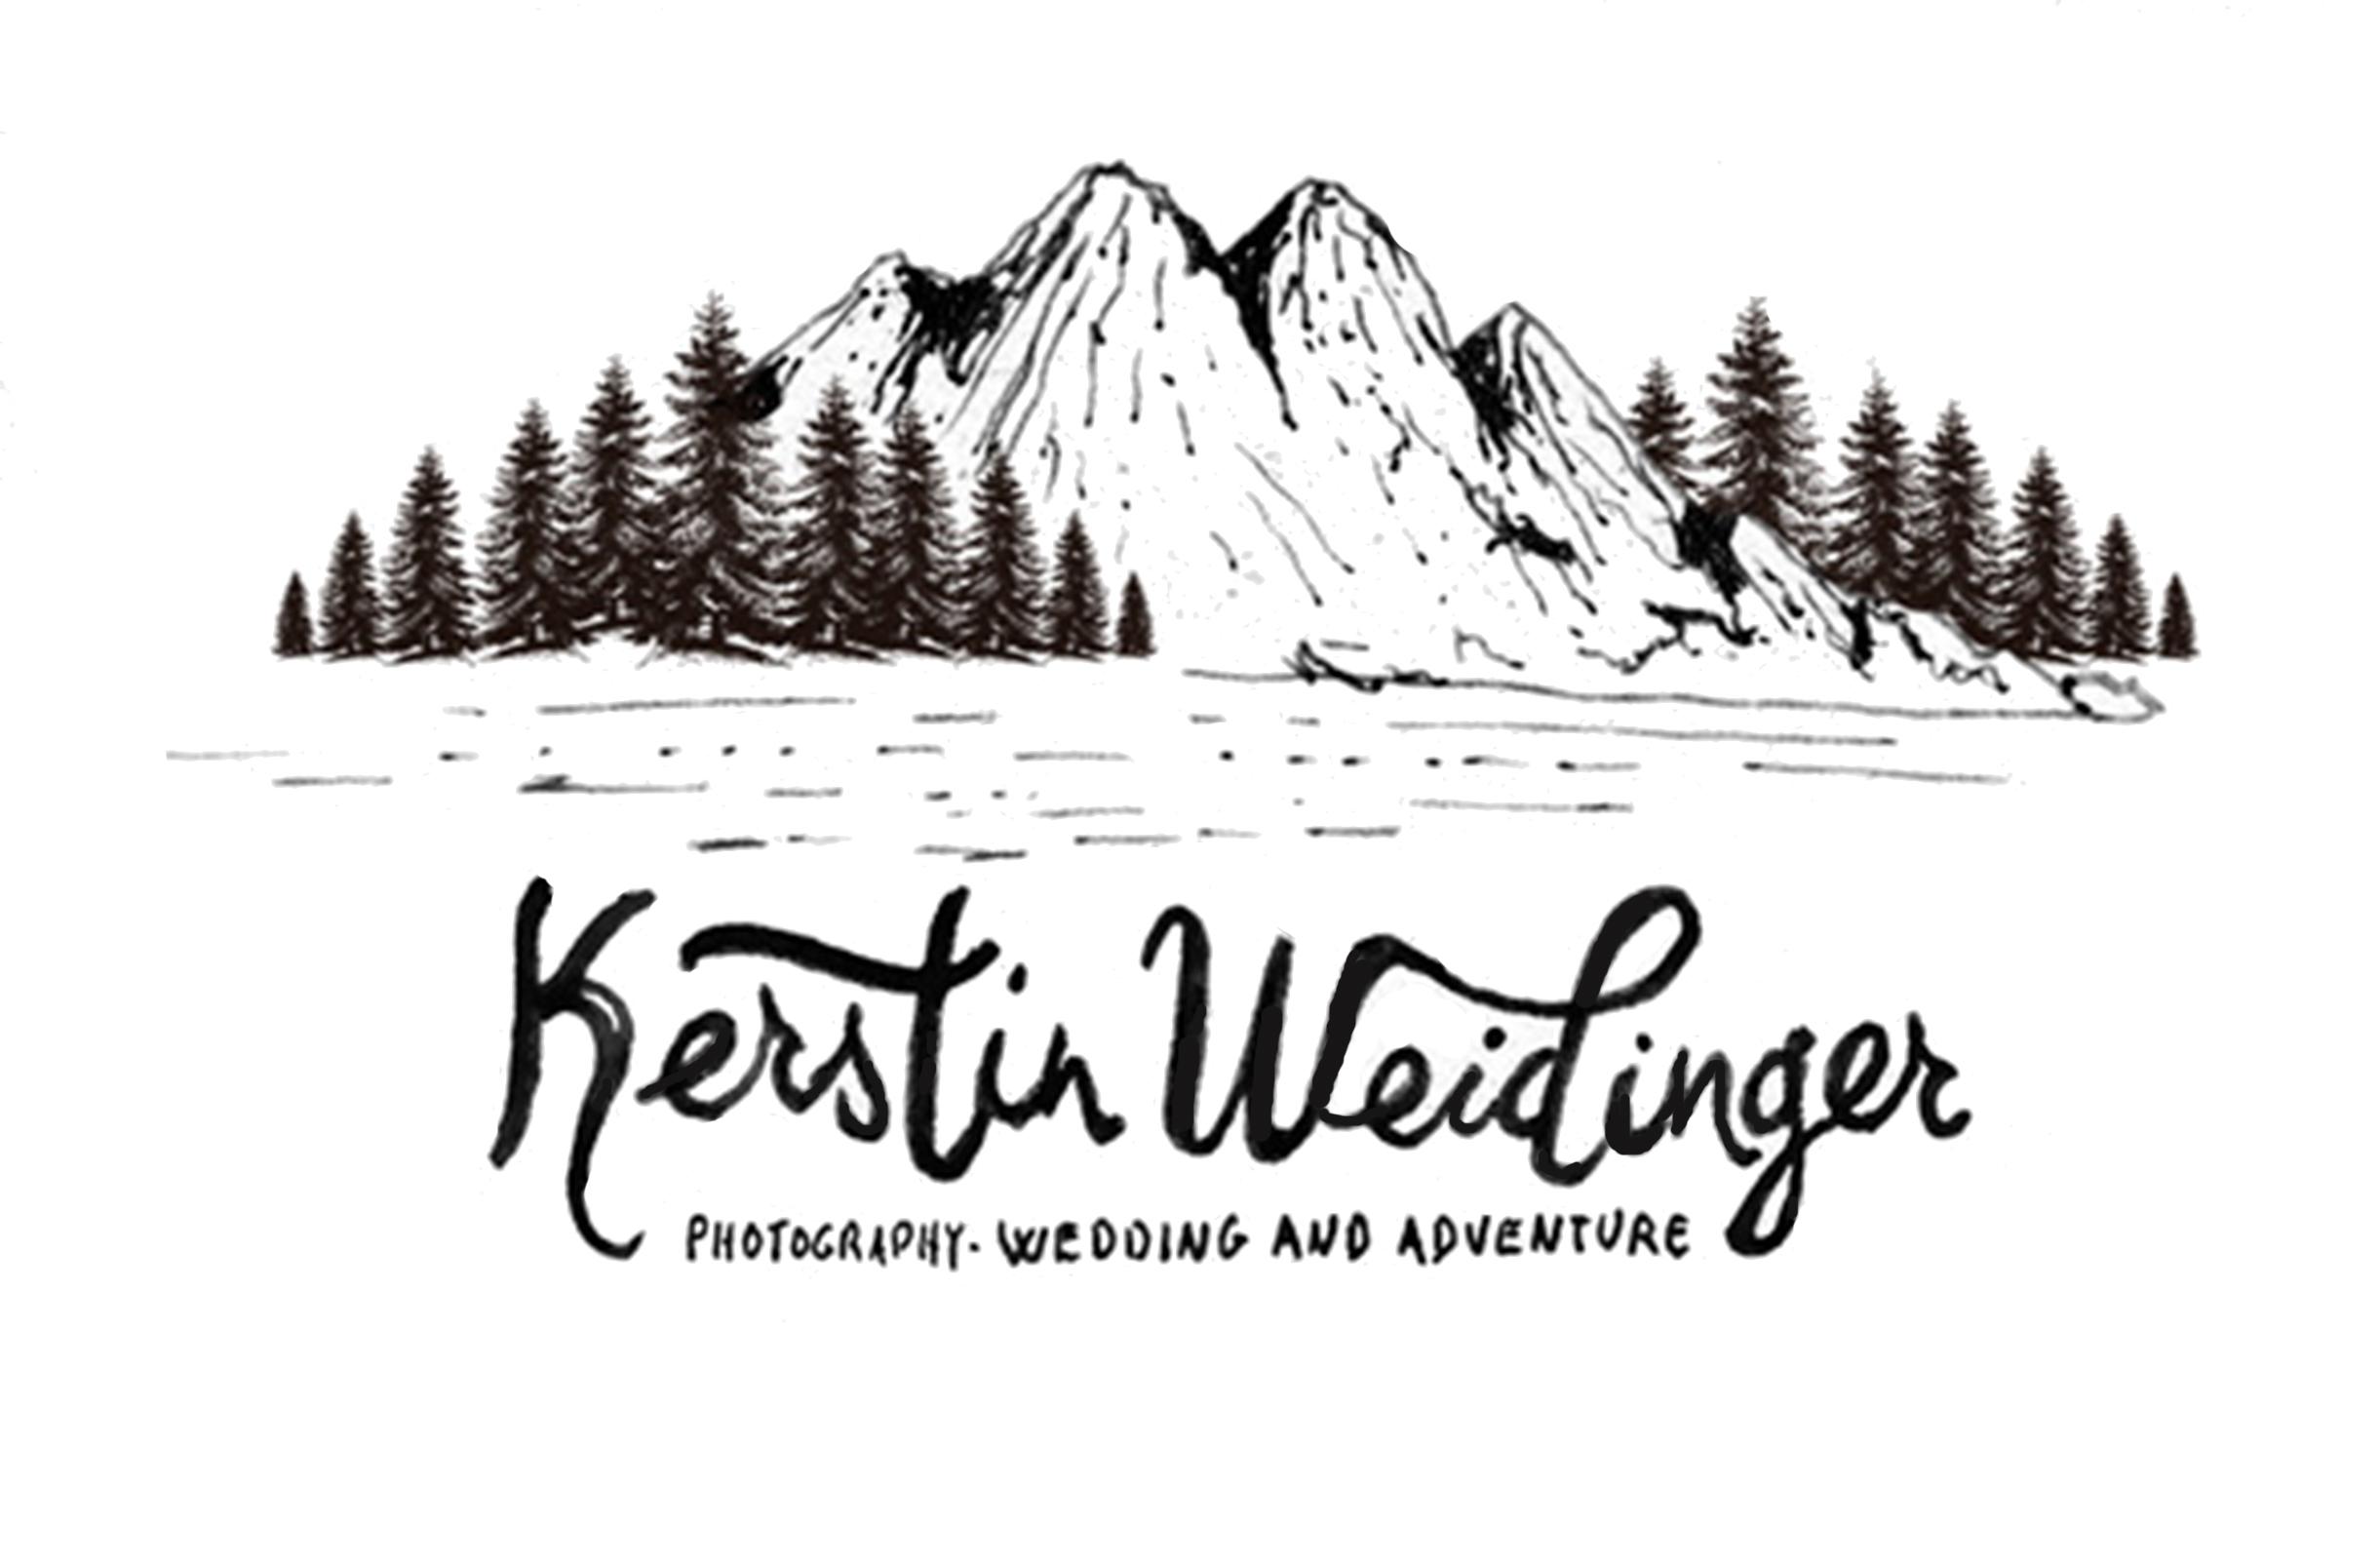 Kerstin Weidinger